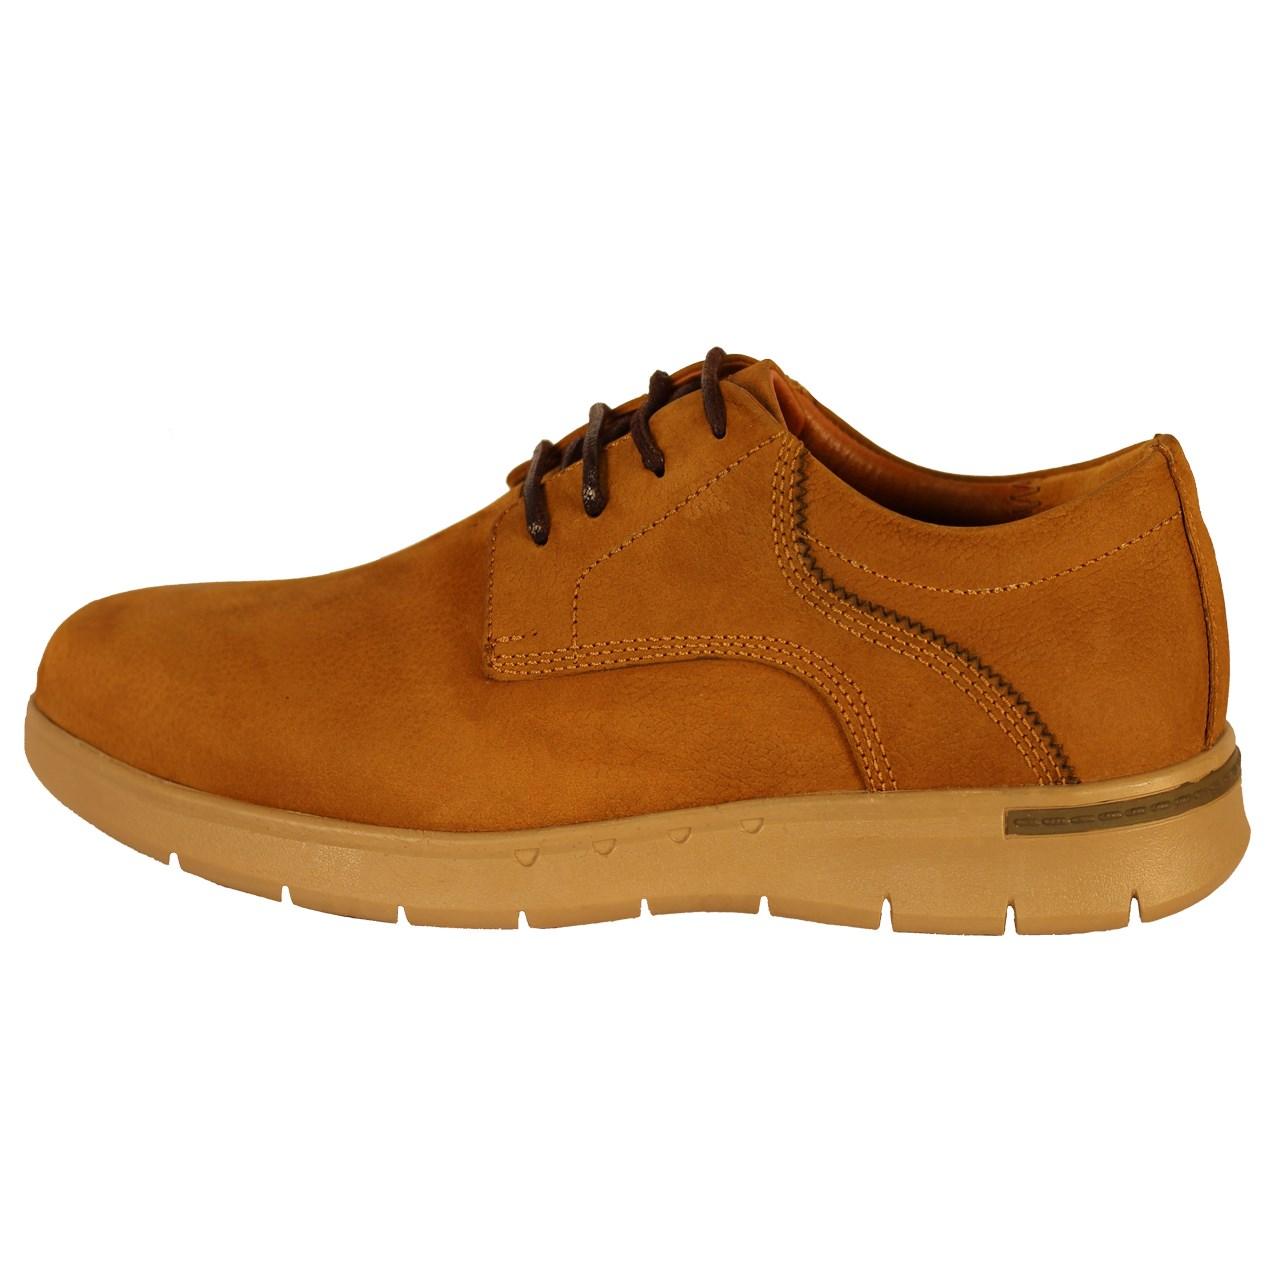 کفش مردانه چرم طبیعی  ژست مدل 1014